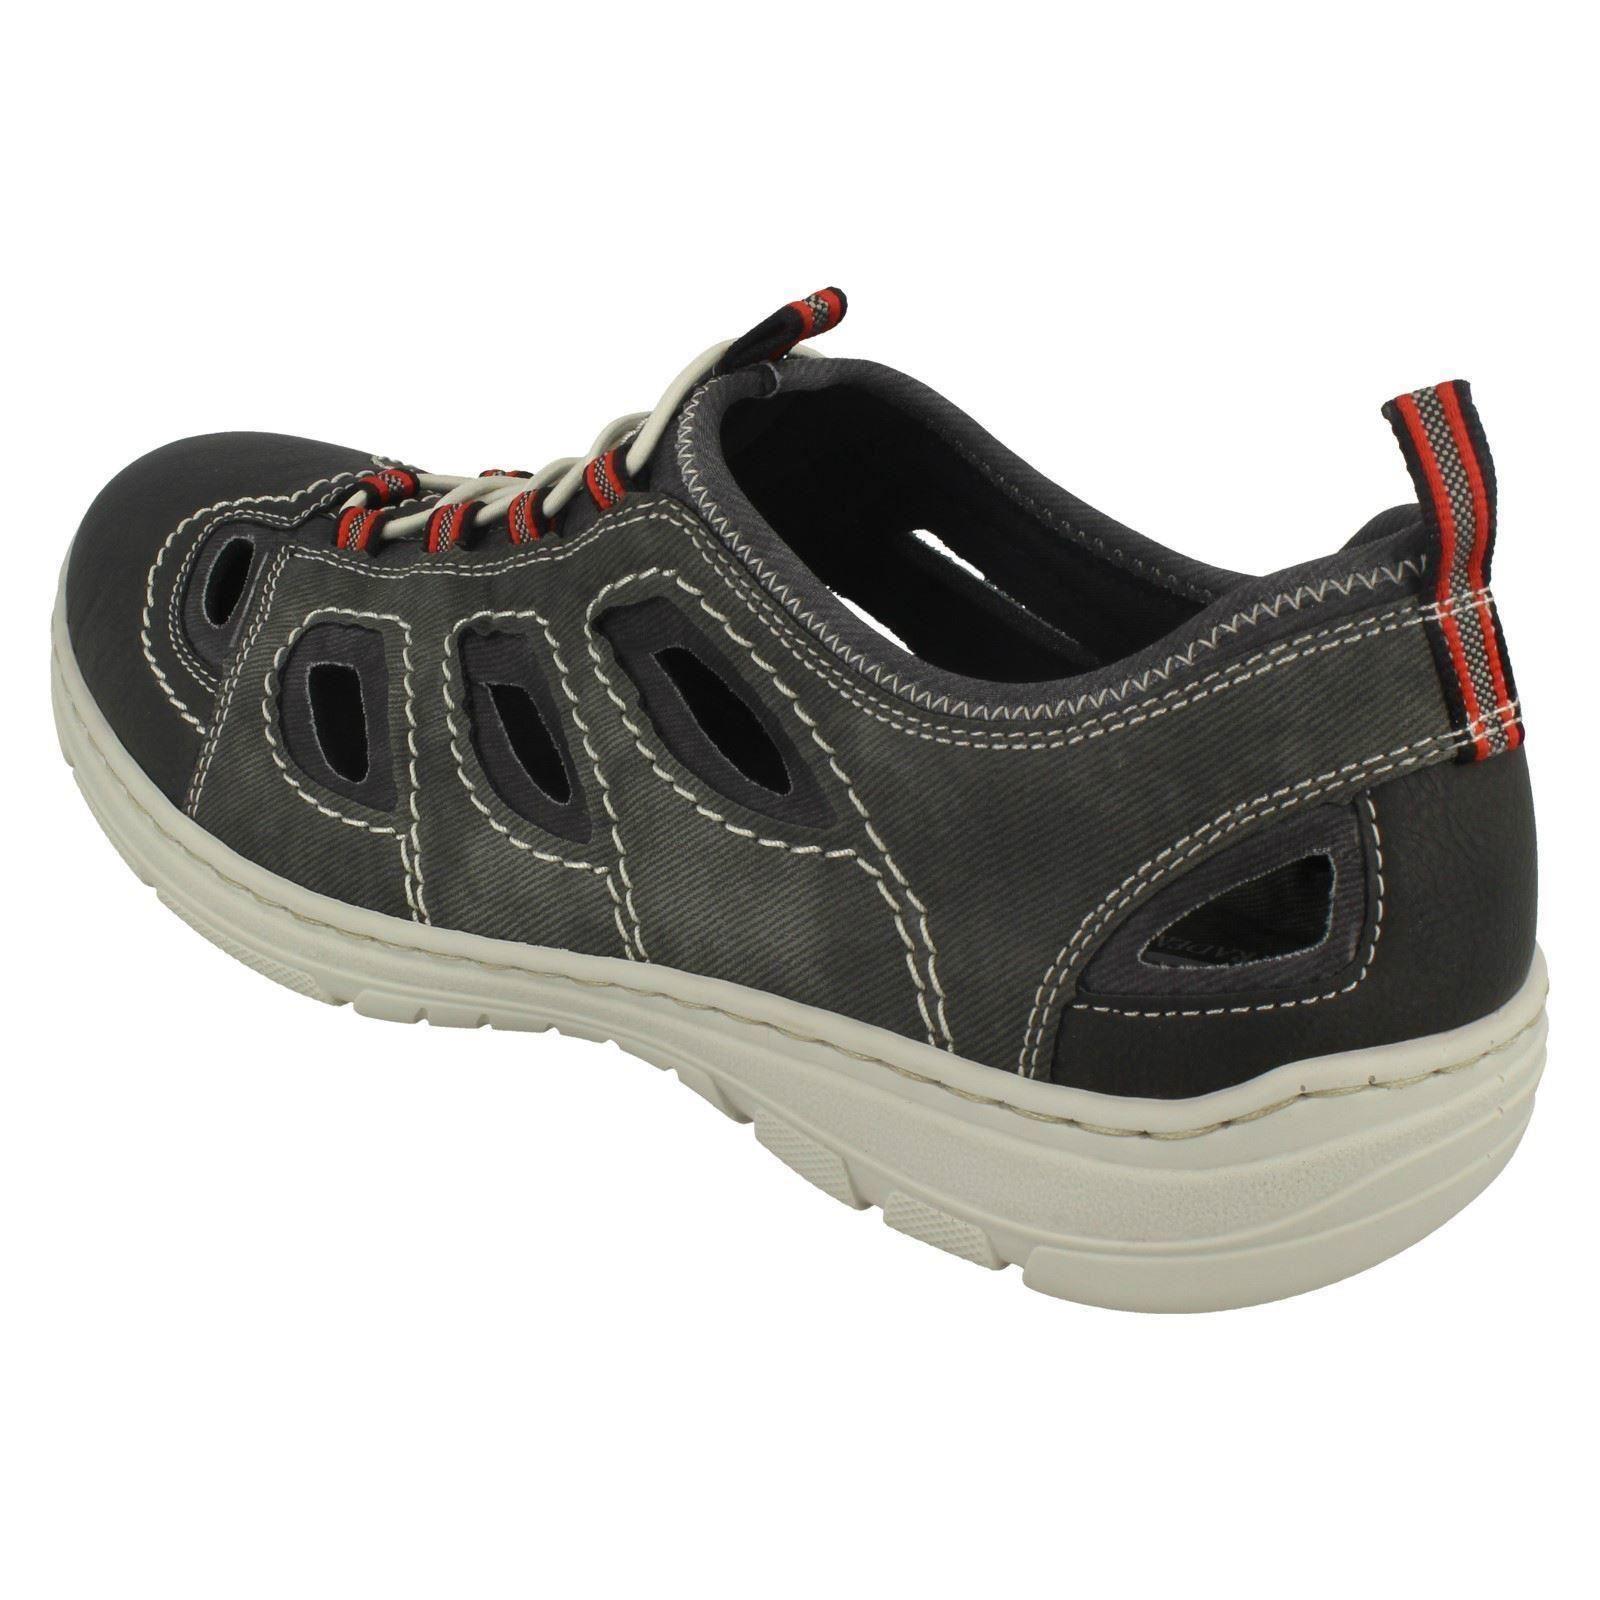 Rieker   Out Herren Cut Out  Casual Schuhes 15285 b51203